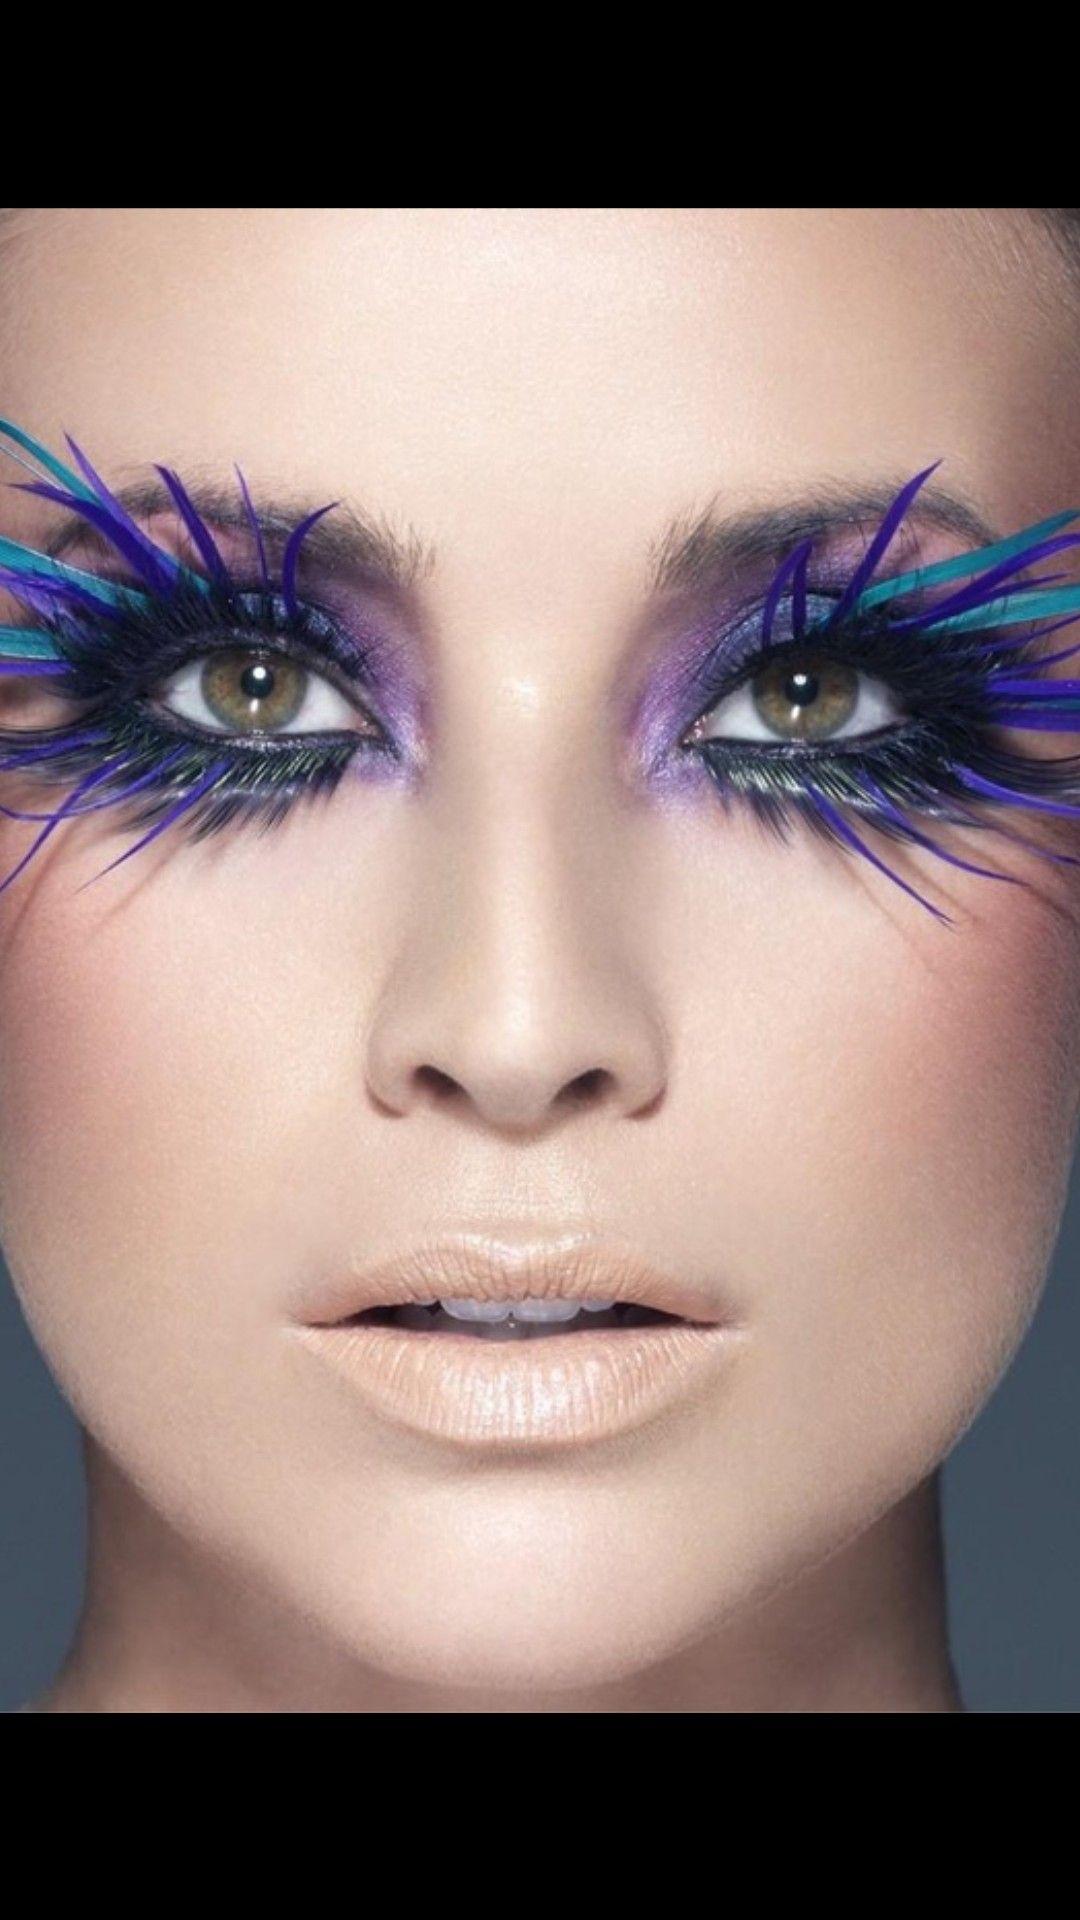 maquillage artistique masque yeux. Black Bedroom Furniture Sets. Home Design Ideas